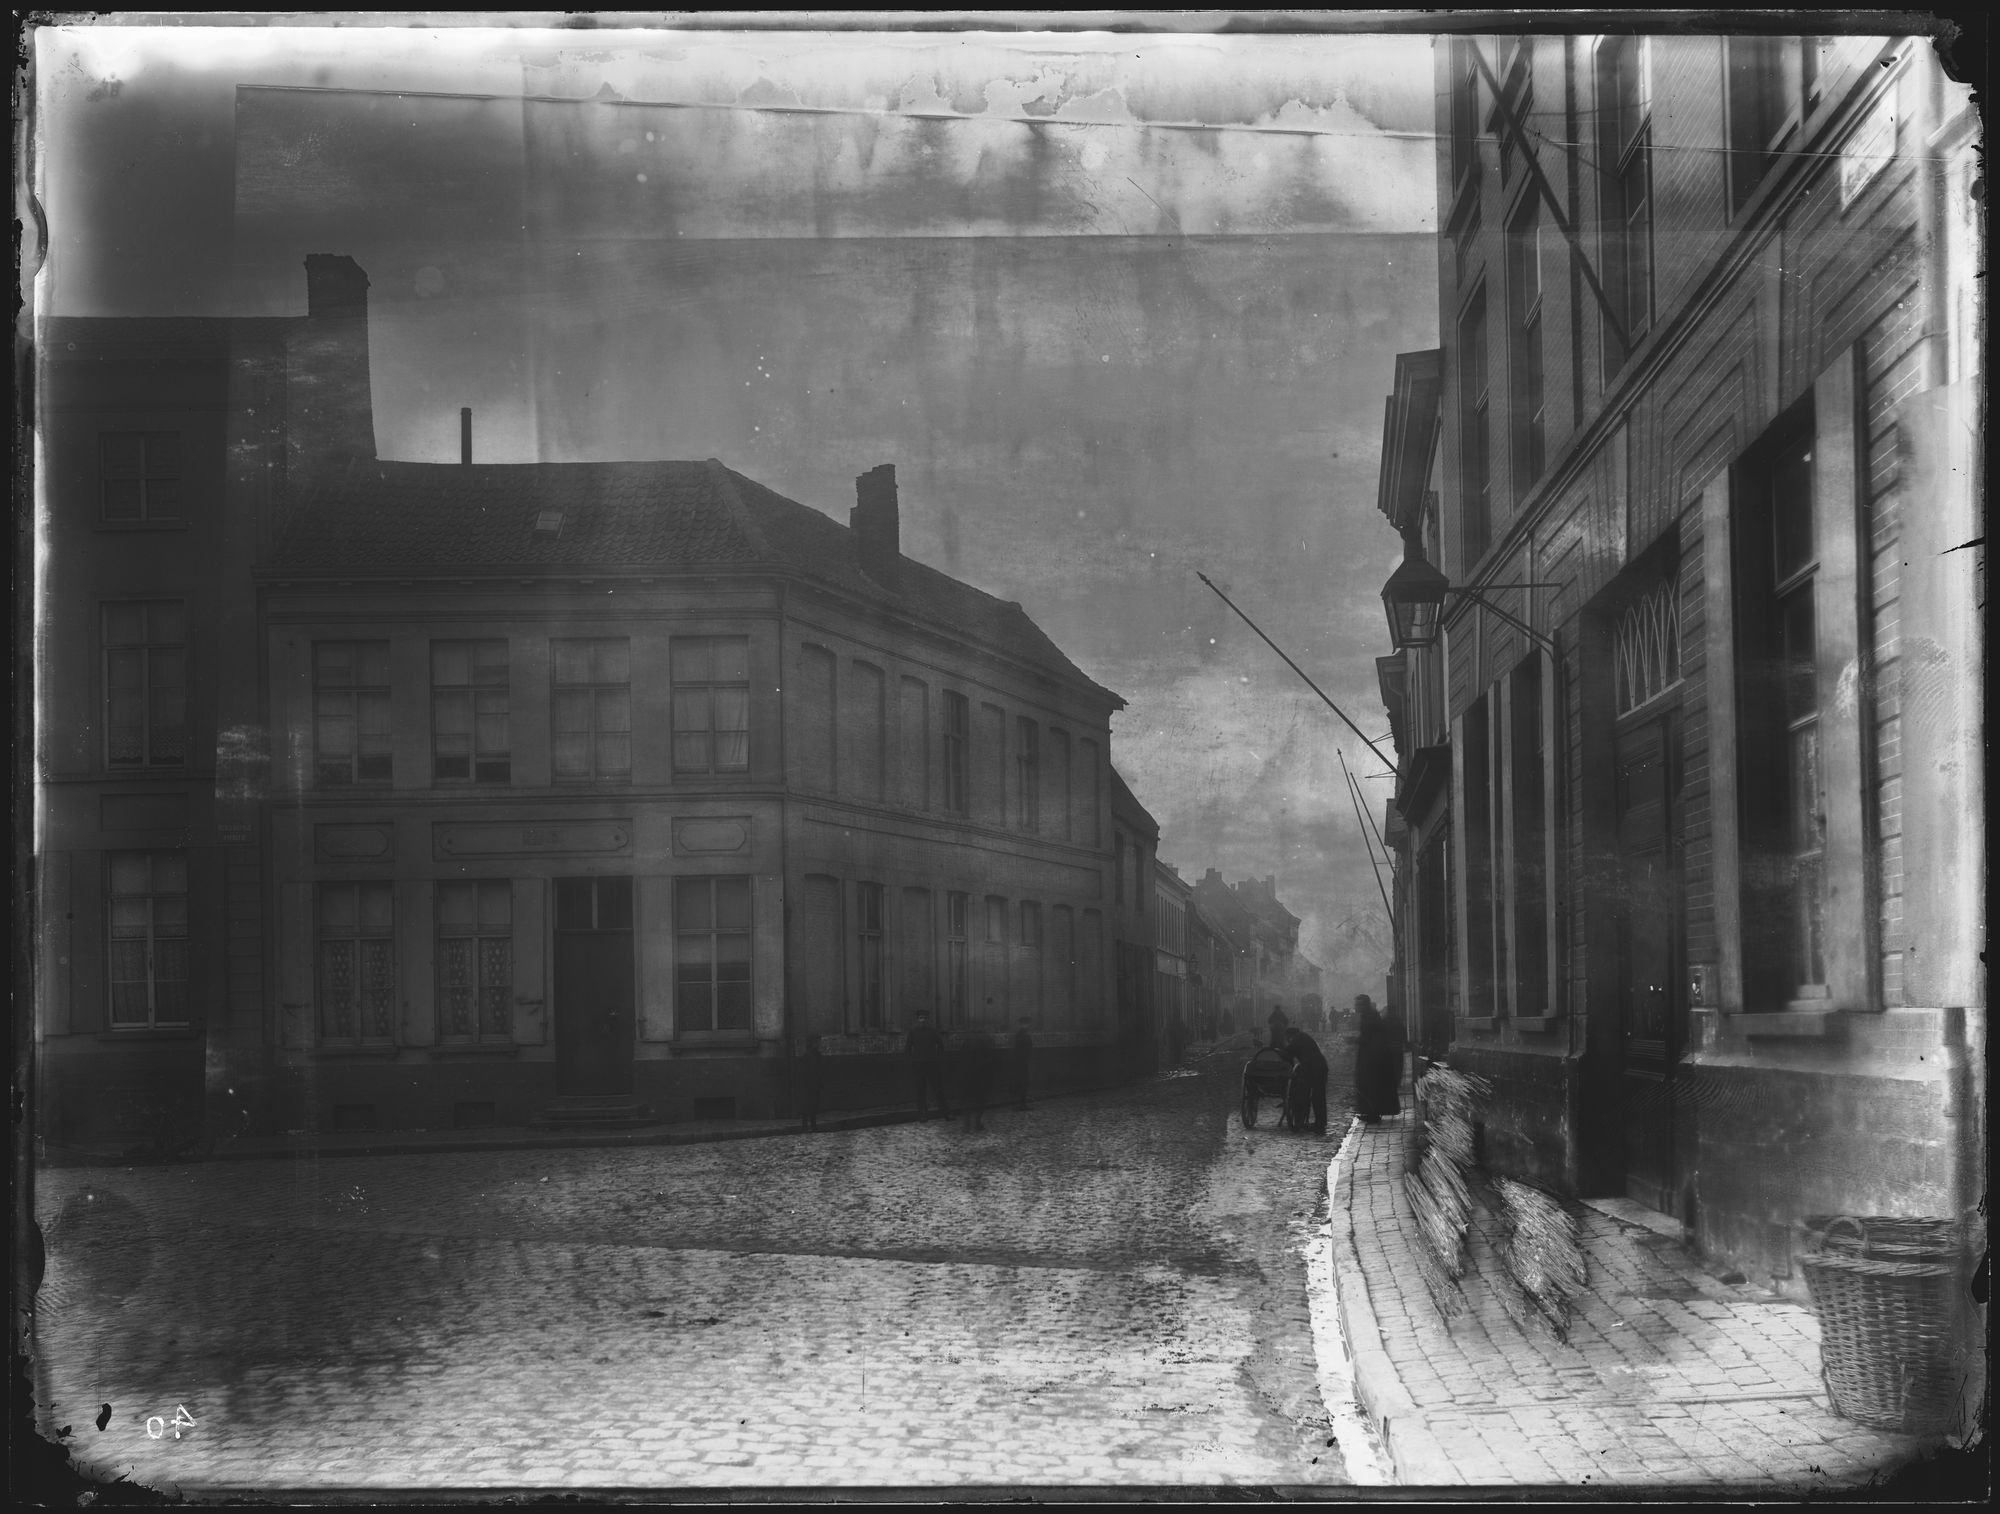 Overleiestraat circa 1900